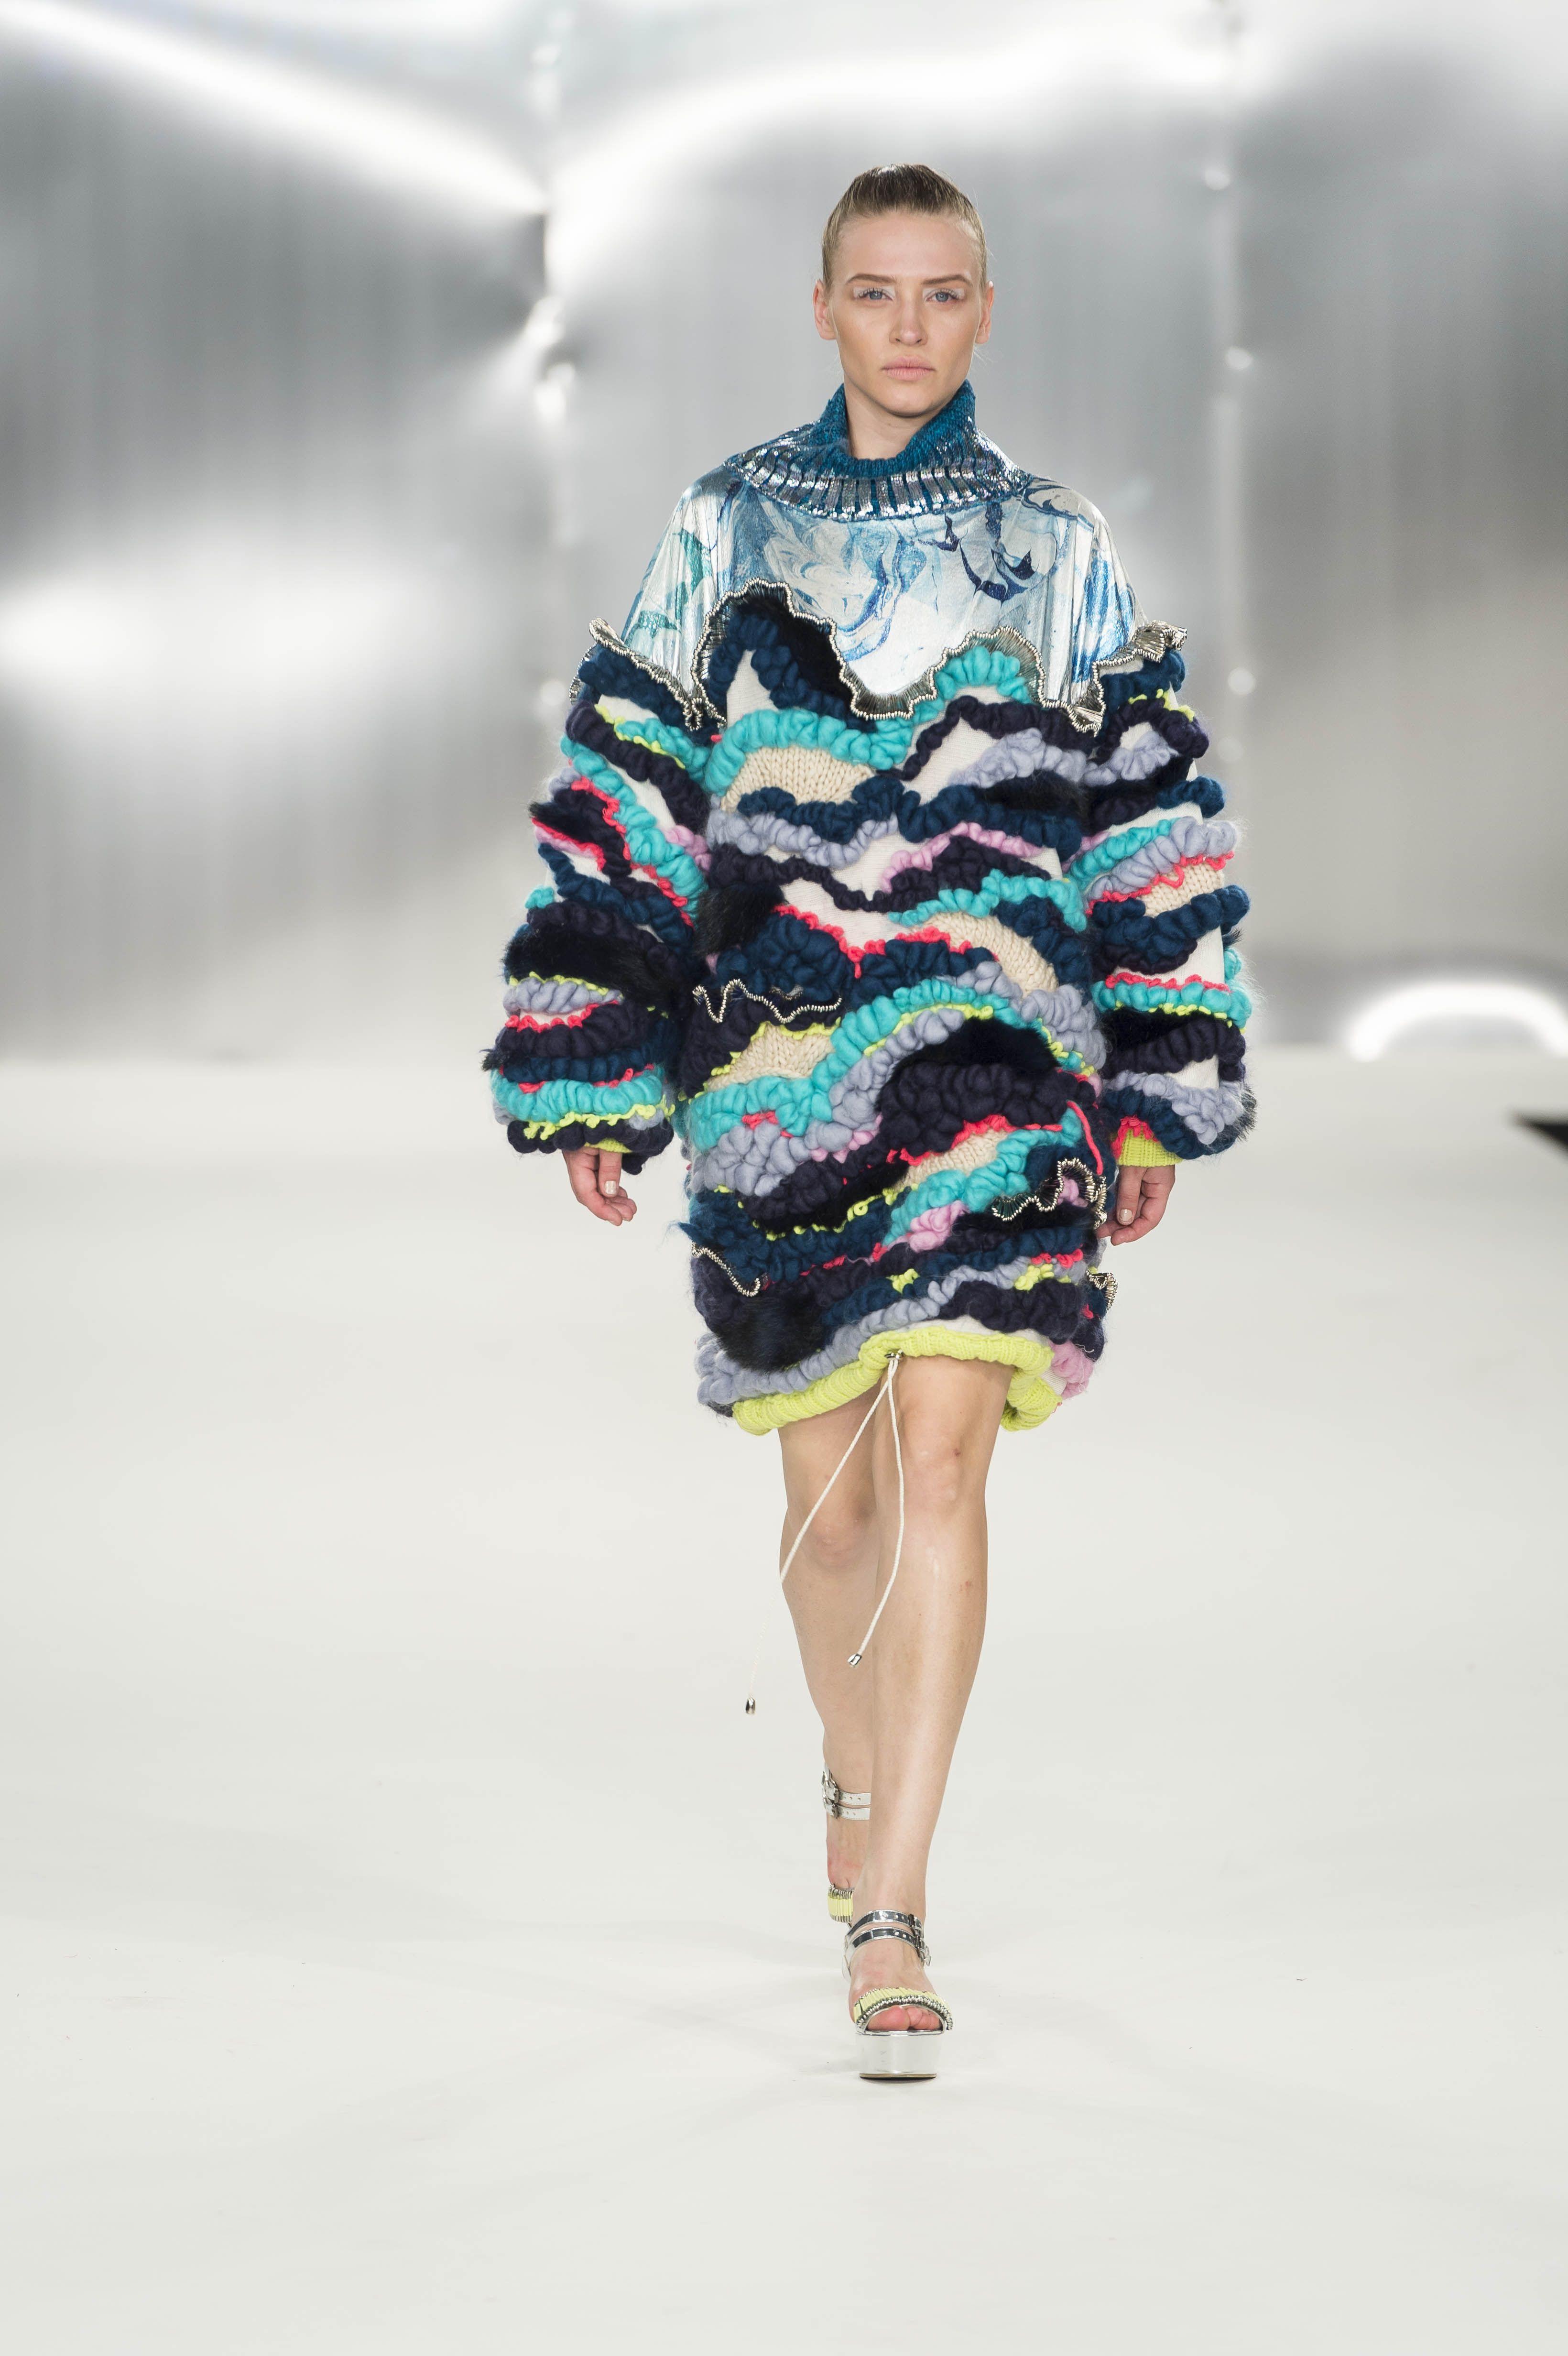 Design By De Montfort University Dmu Fashion Design Student Imogen Abbot On The Catwalk At Graduate Fashion Week Gfw Textiles Fashion Fashion Fashion Design